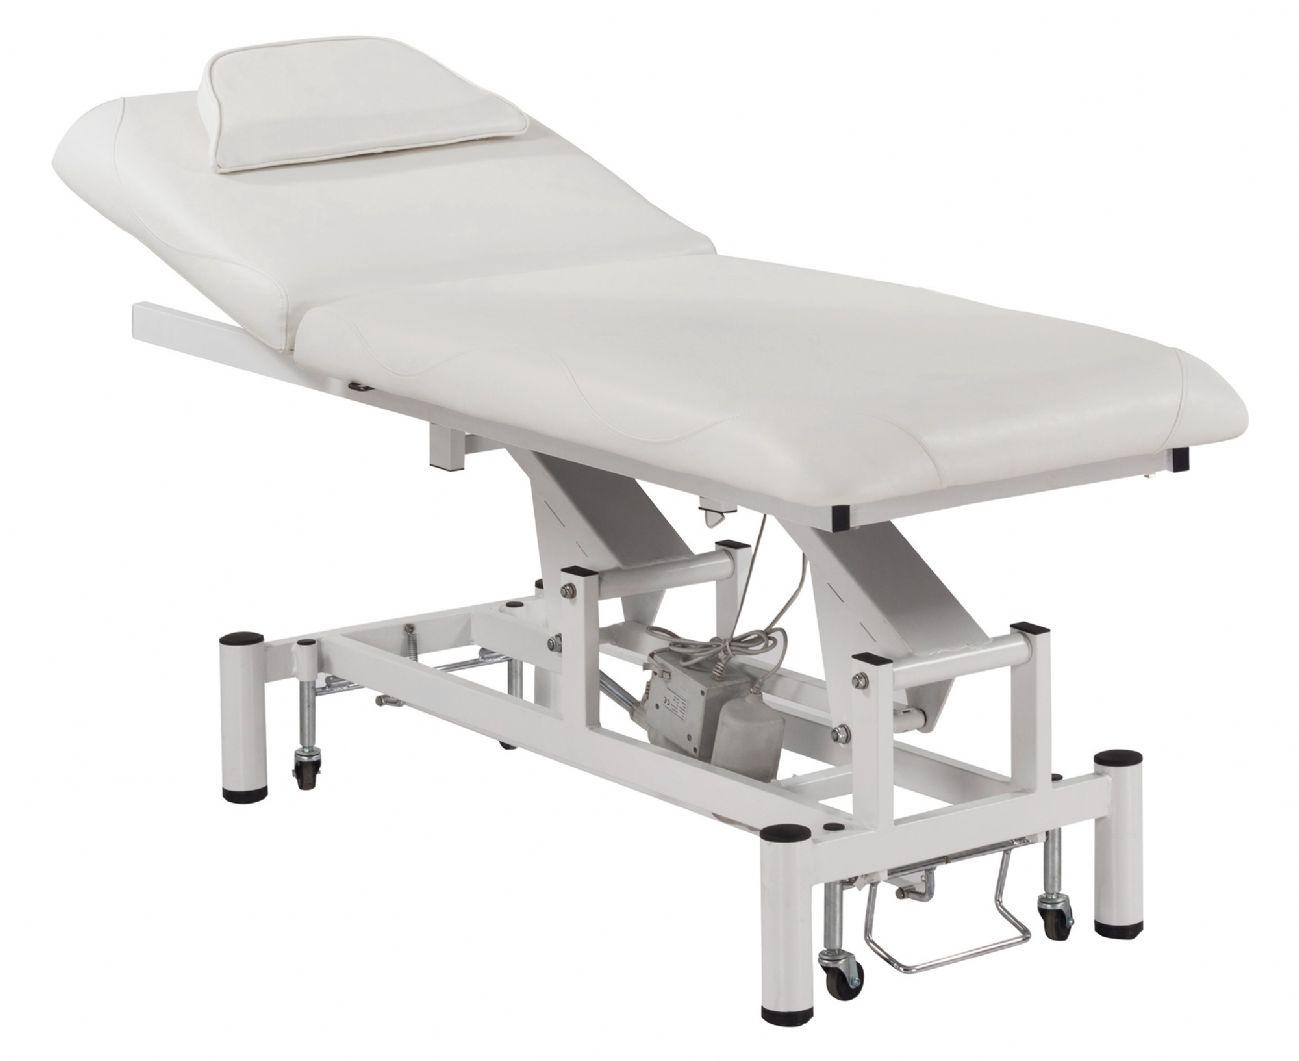 Lettino Massaggio Portatile Milano.Medical Estetic Online Sale Of Equipment For Beauty Centers And